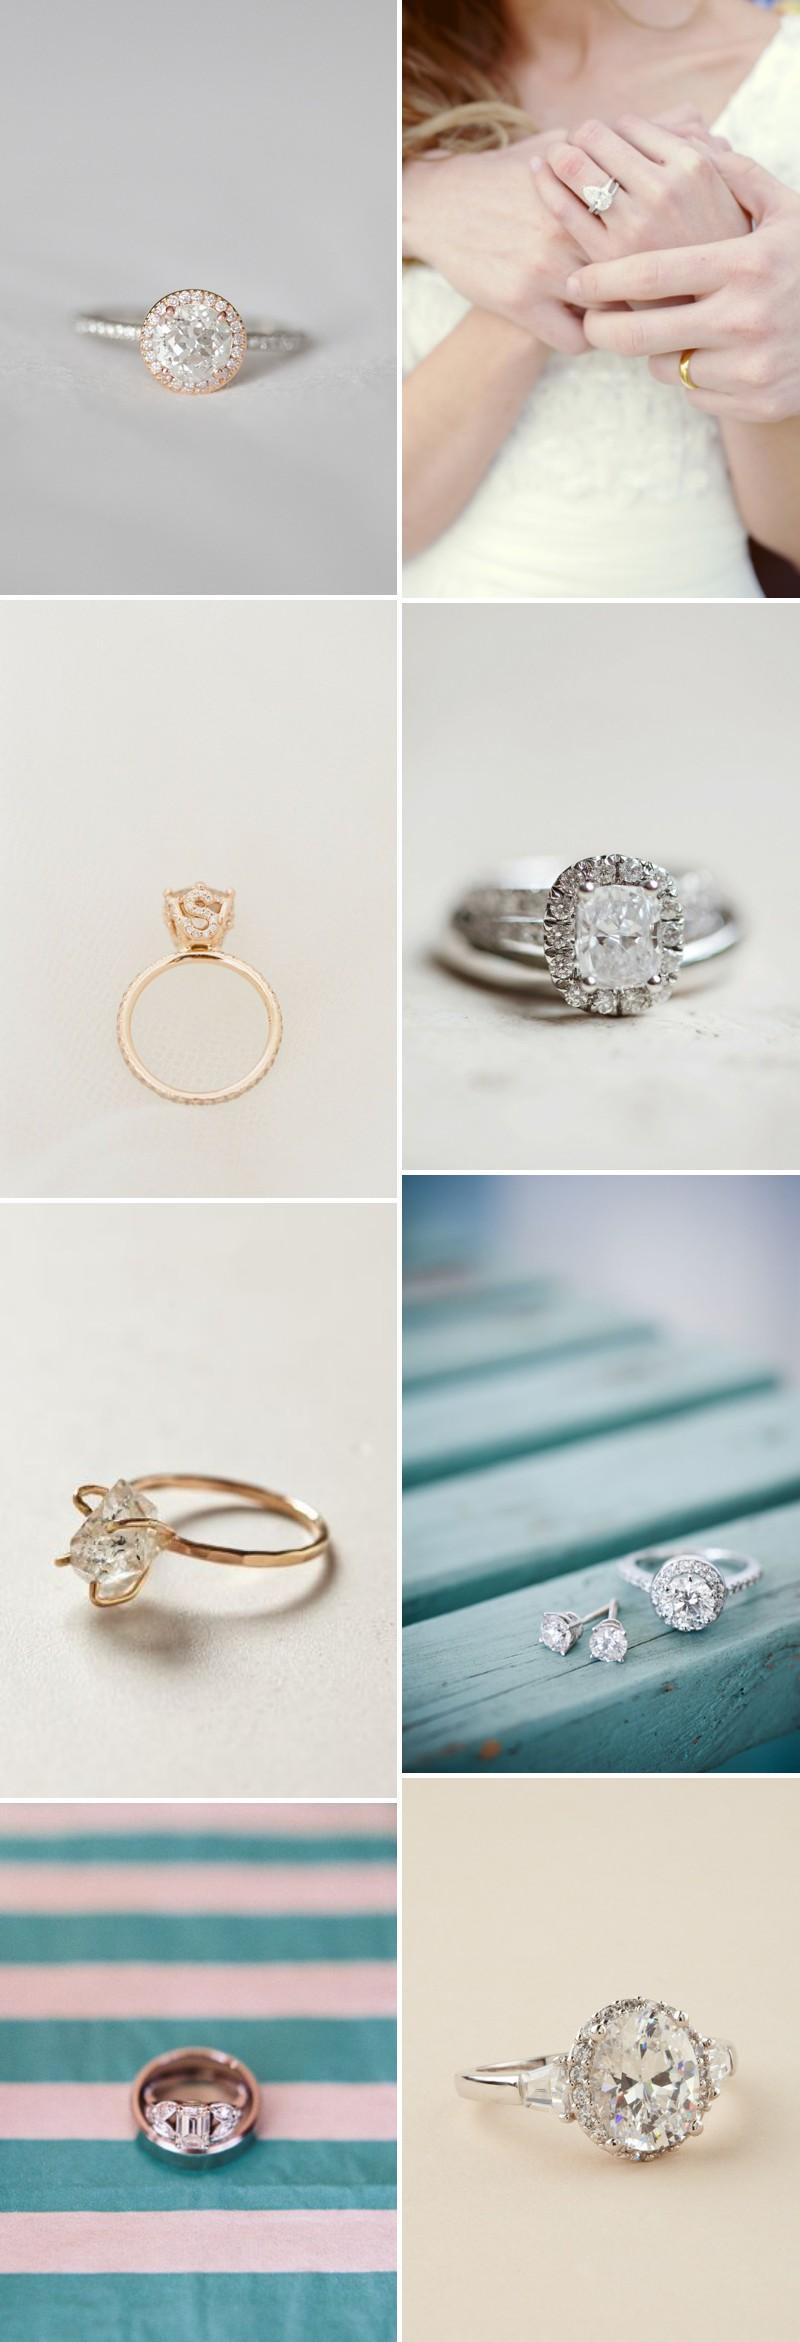 antique wedding rings pretty wedding rings Simple Antique Wedding Rings